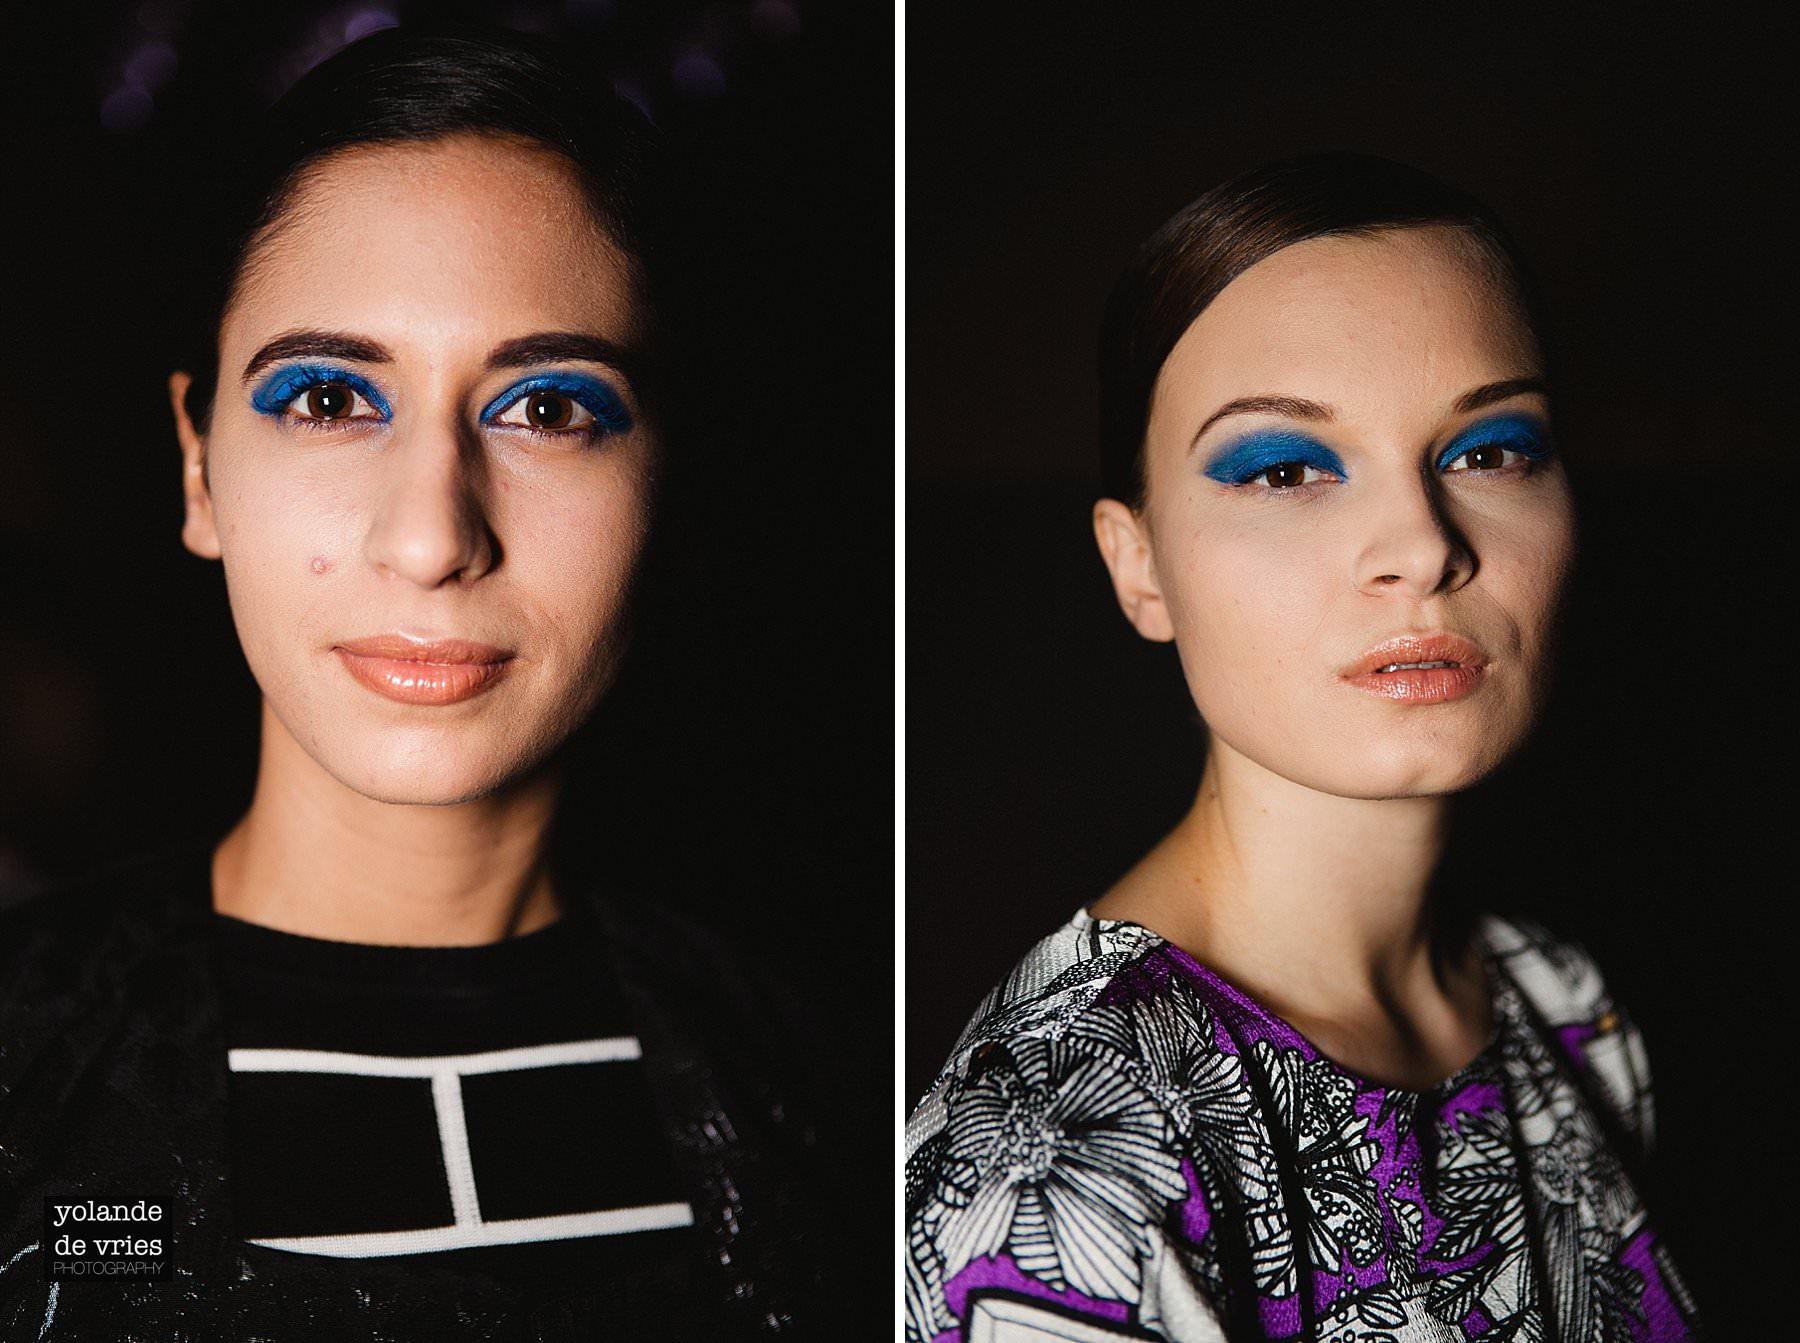 Olivia-Rubin-SS11-London-Fashion-Week-1649.jpg